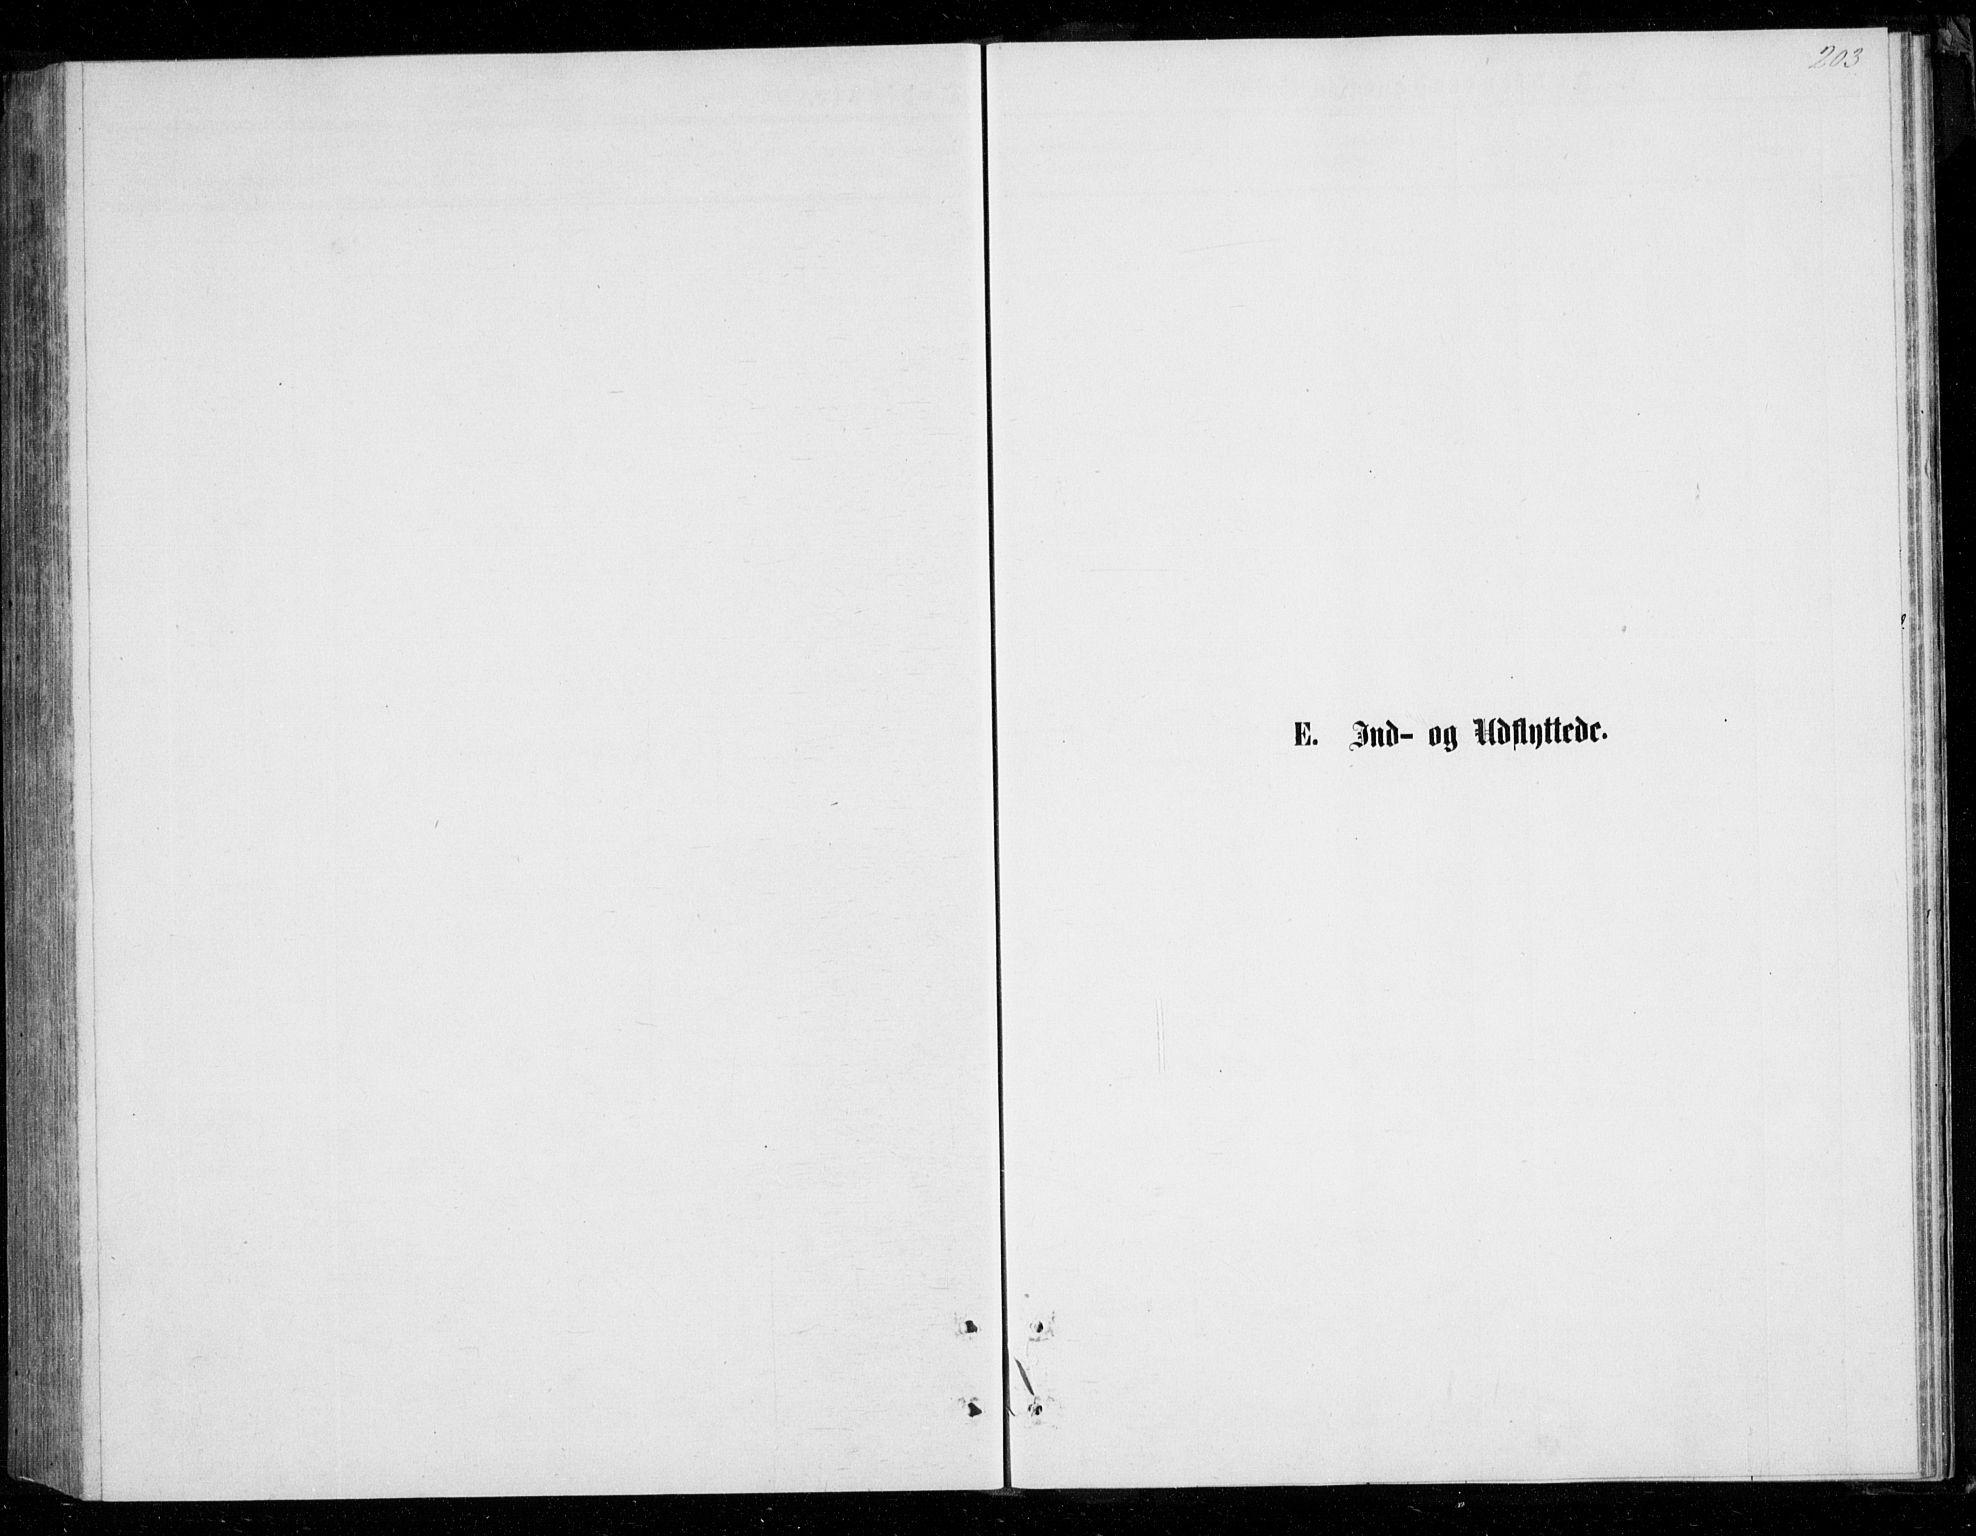 SATØ, Mefjord/Berg sokneprestkontor, G/Ga/Gab/L0003klokker: Klokkerbok nr. 3, 1874-1886, s. 203